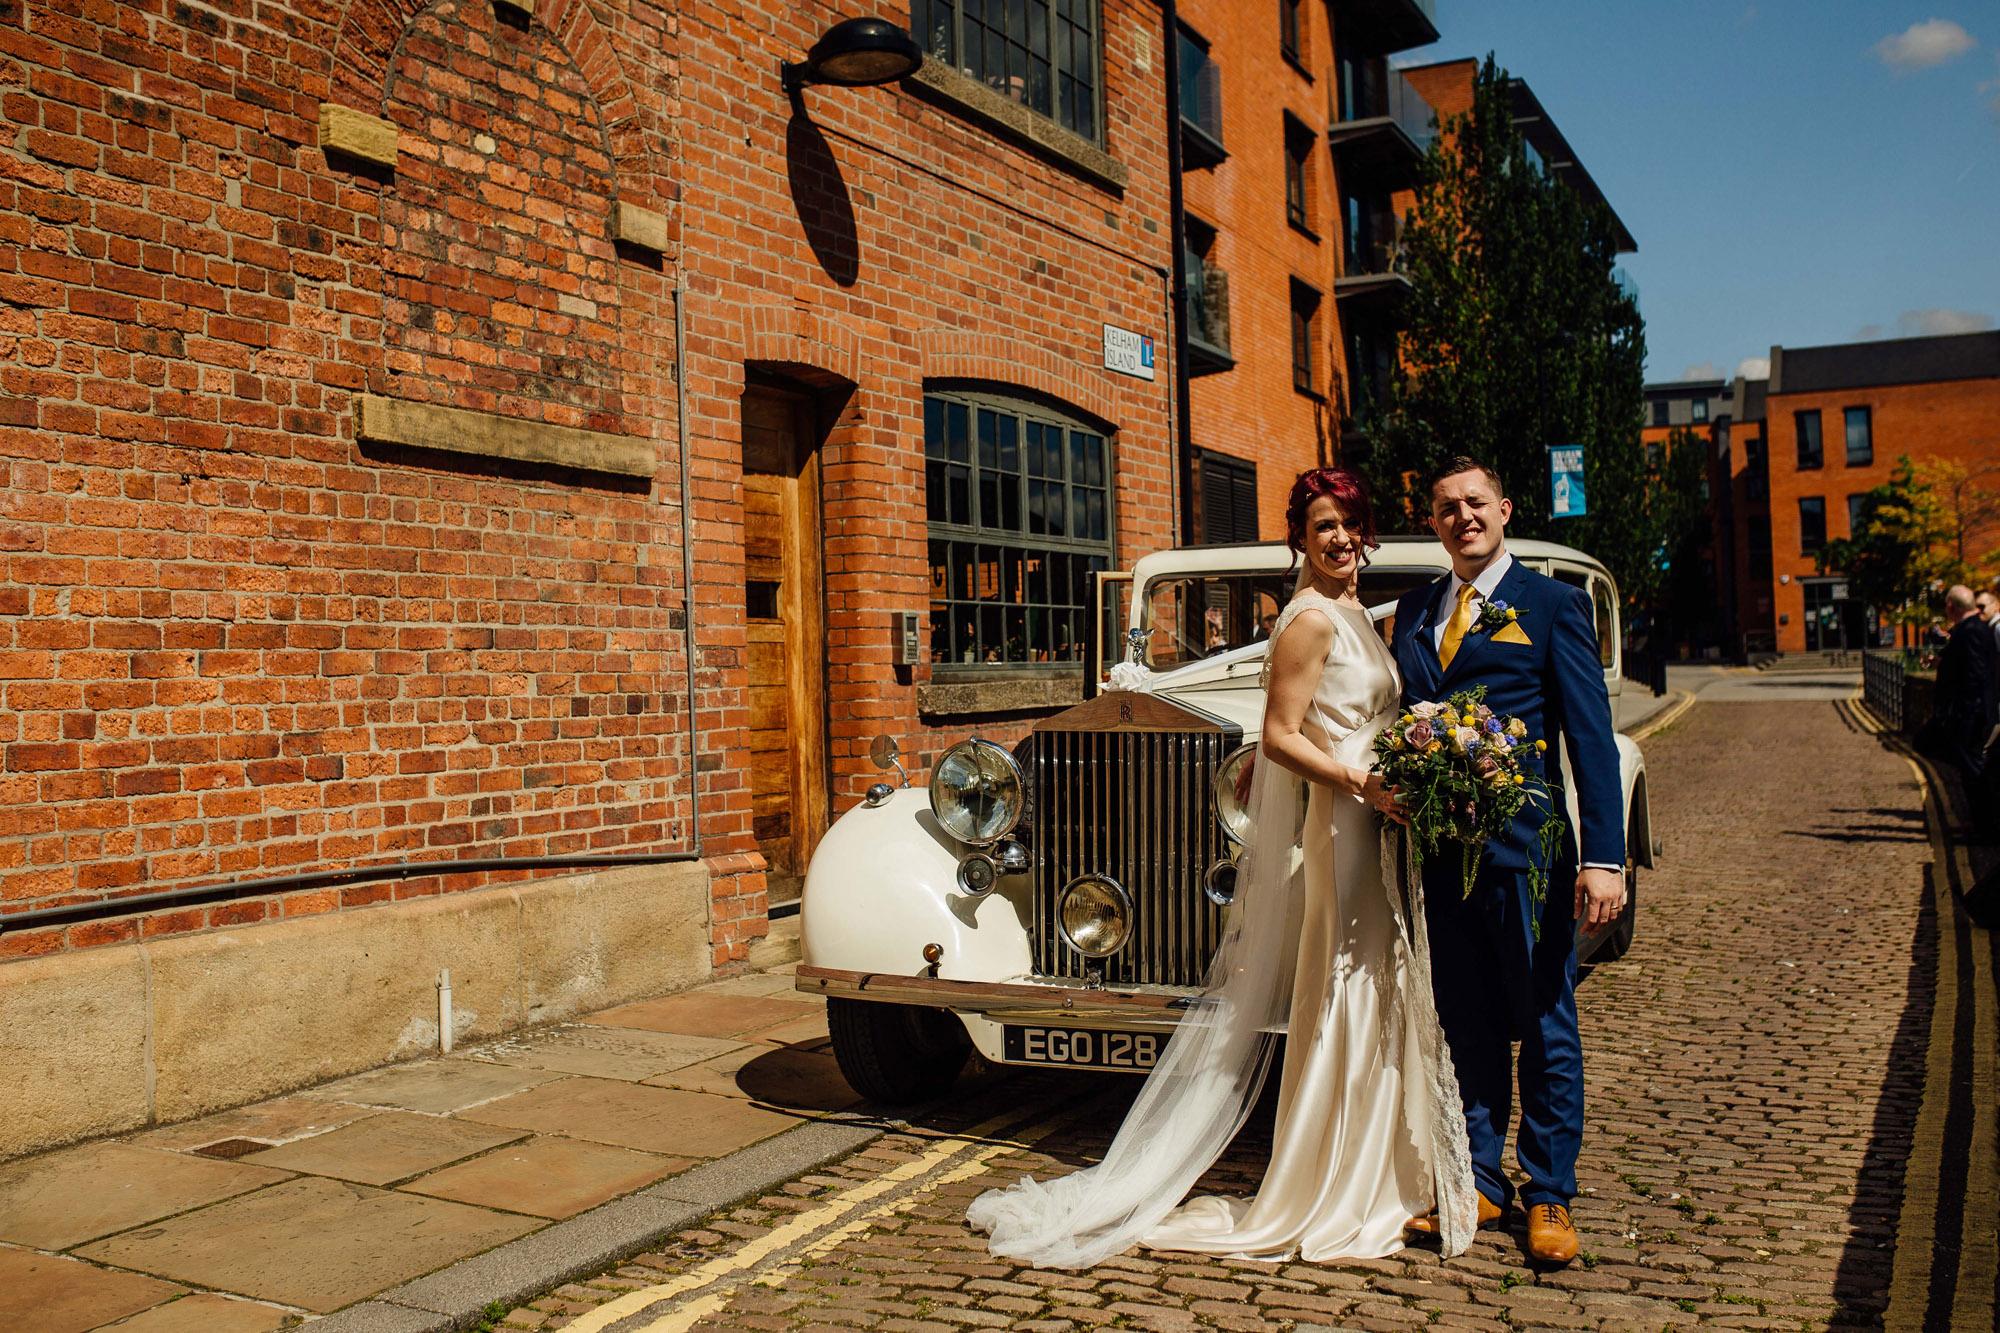 Sarah-Honeysuckle-Bias-Cut-Silk-Vintage-Inspired-Wedding-Gown-Sheffield-Wedding-Kate-Beaumont-36.jpg